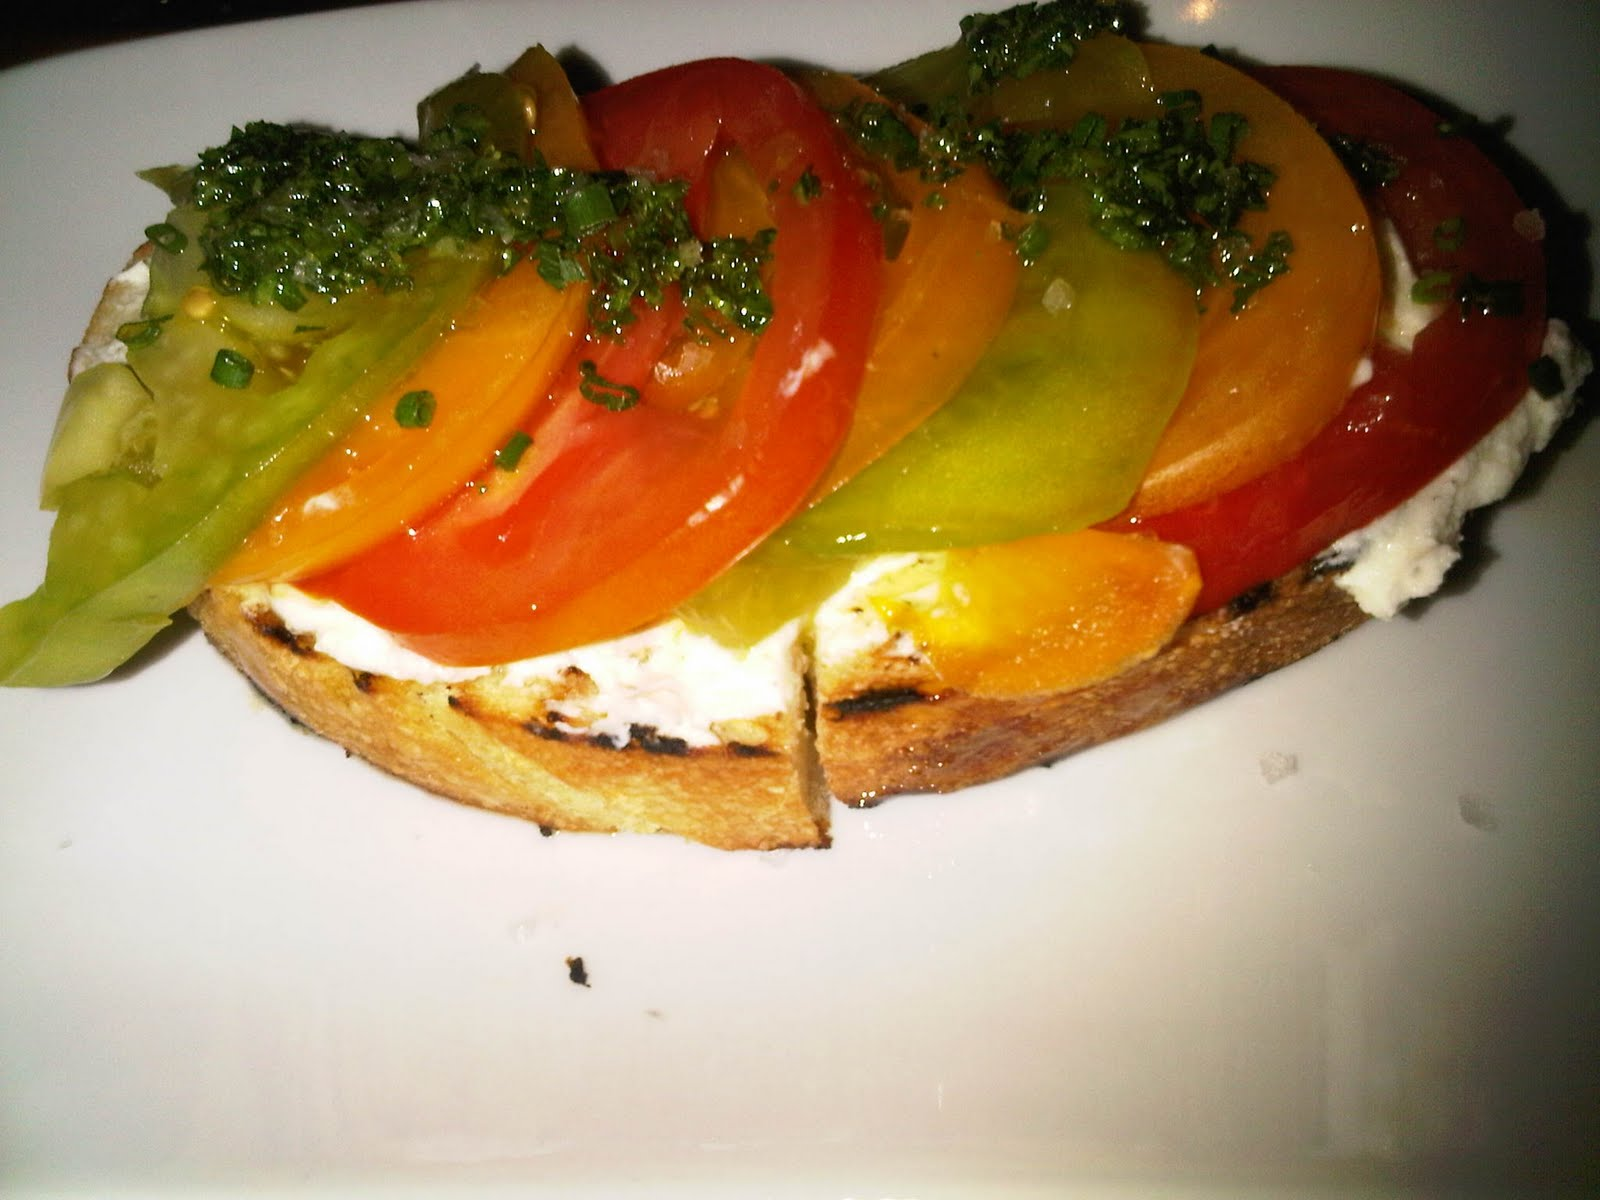 http://2.bp.blogspot.com/_-Idh_zVB7A8/TIo4vaskHII/AAAAAAAADAw/4rV75B-2Vh8/s1600/tomato.JPG